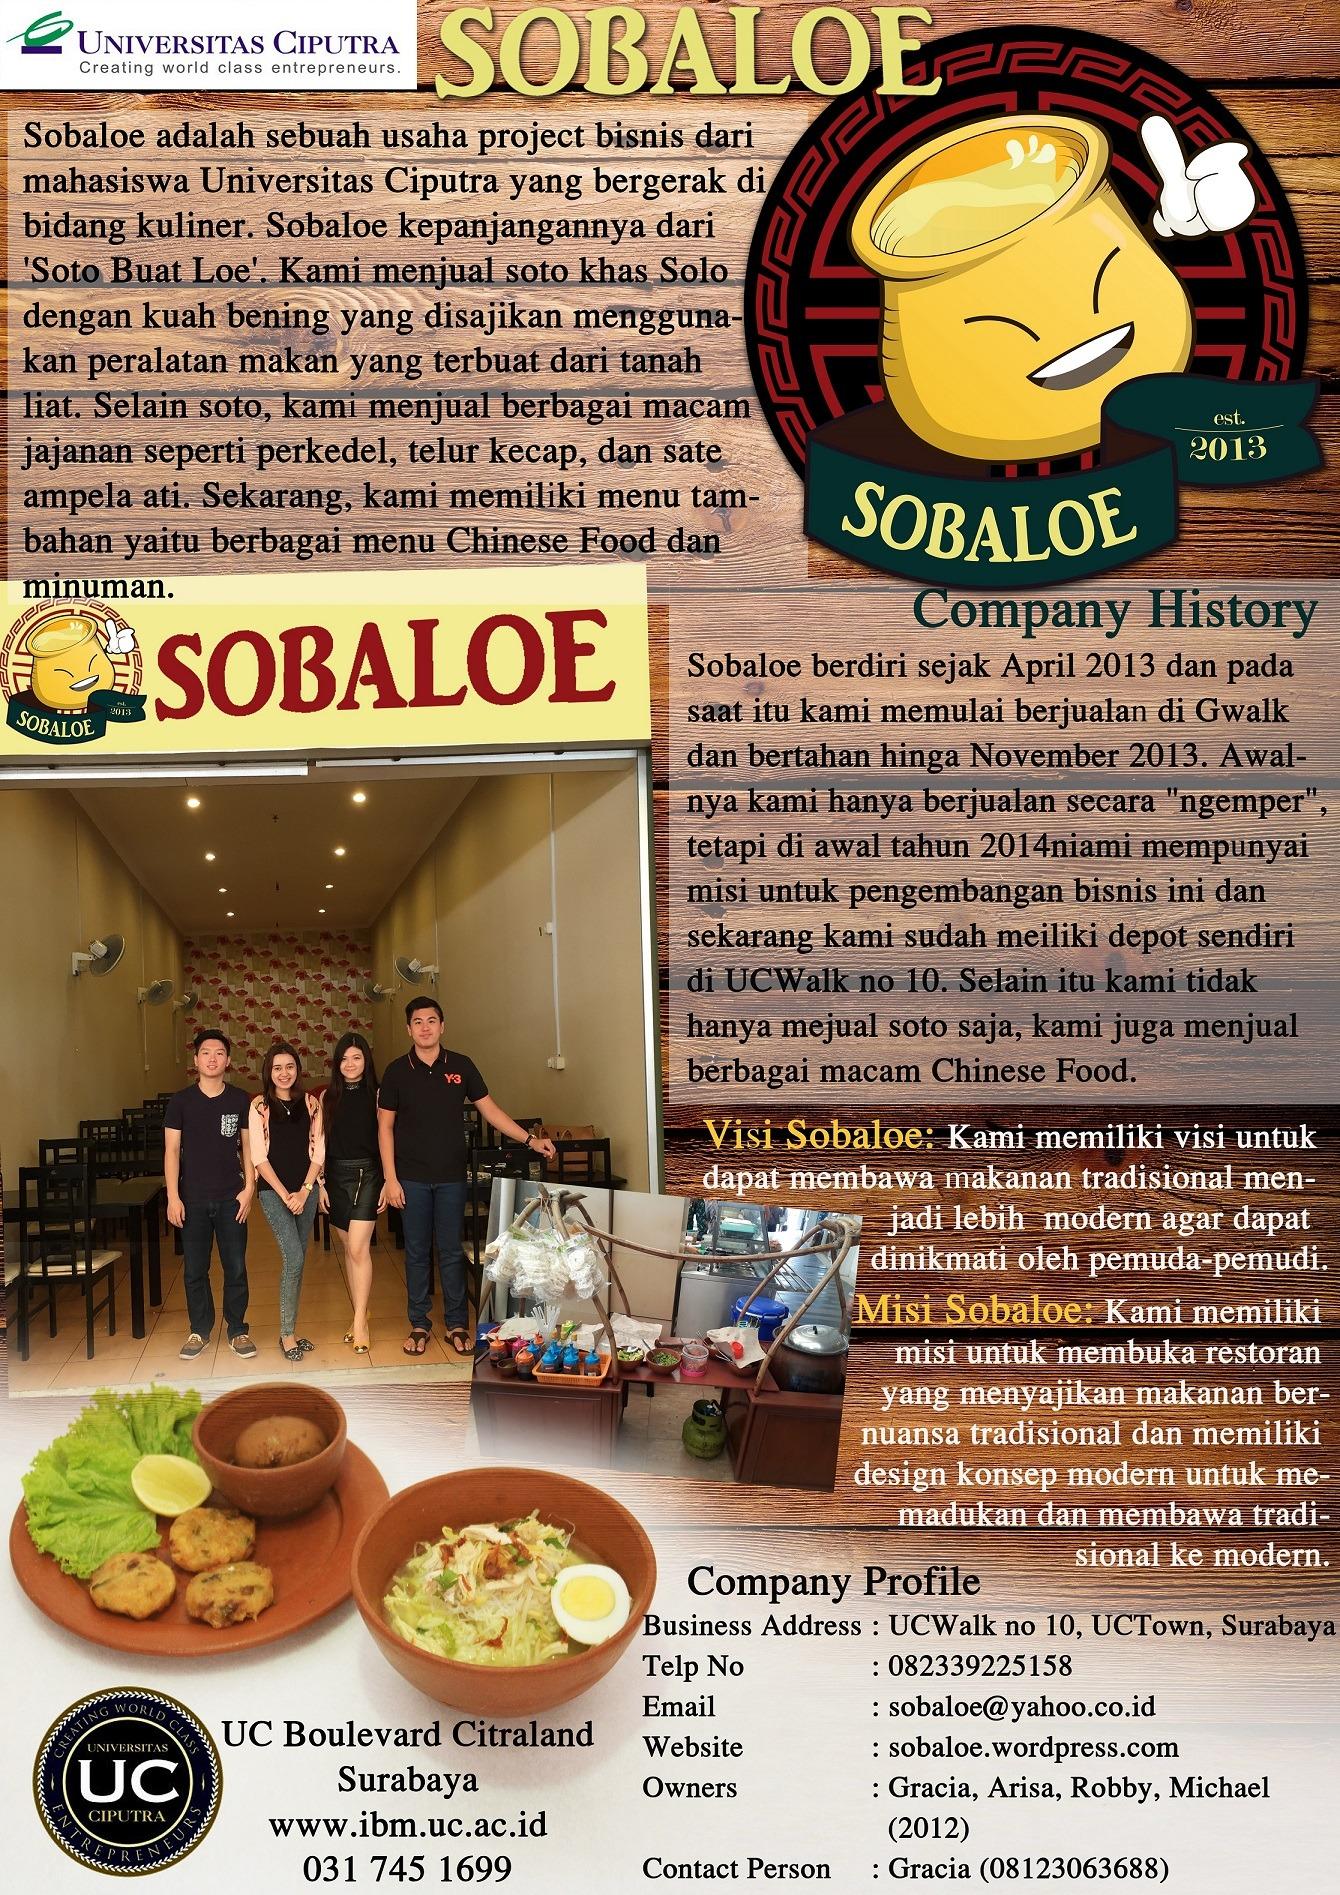 SOBALOE